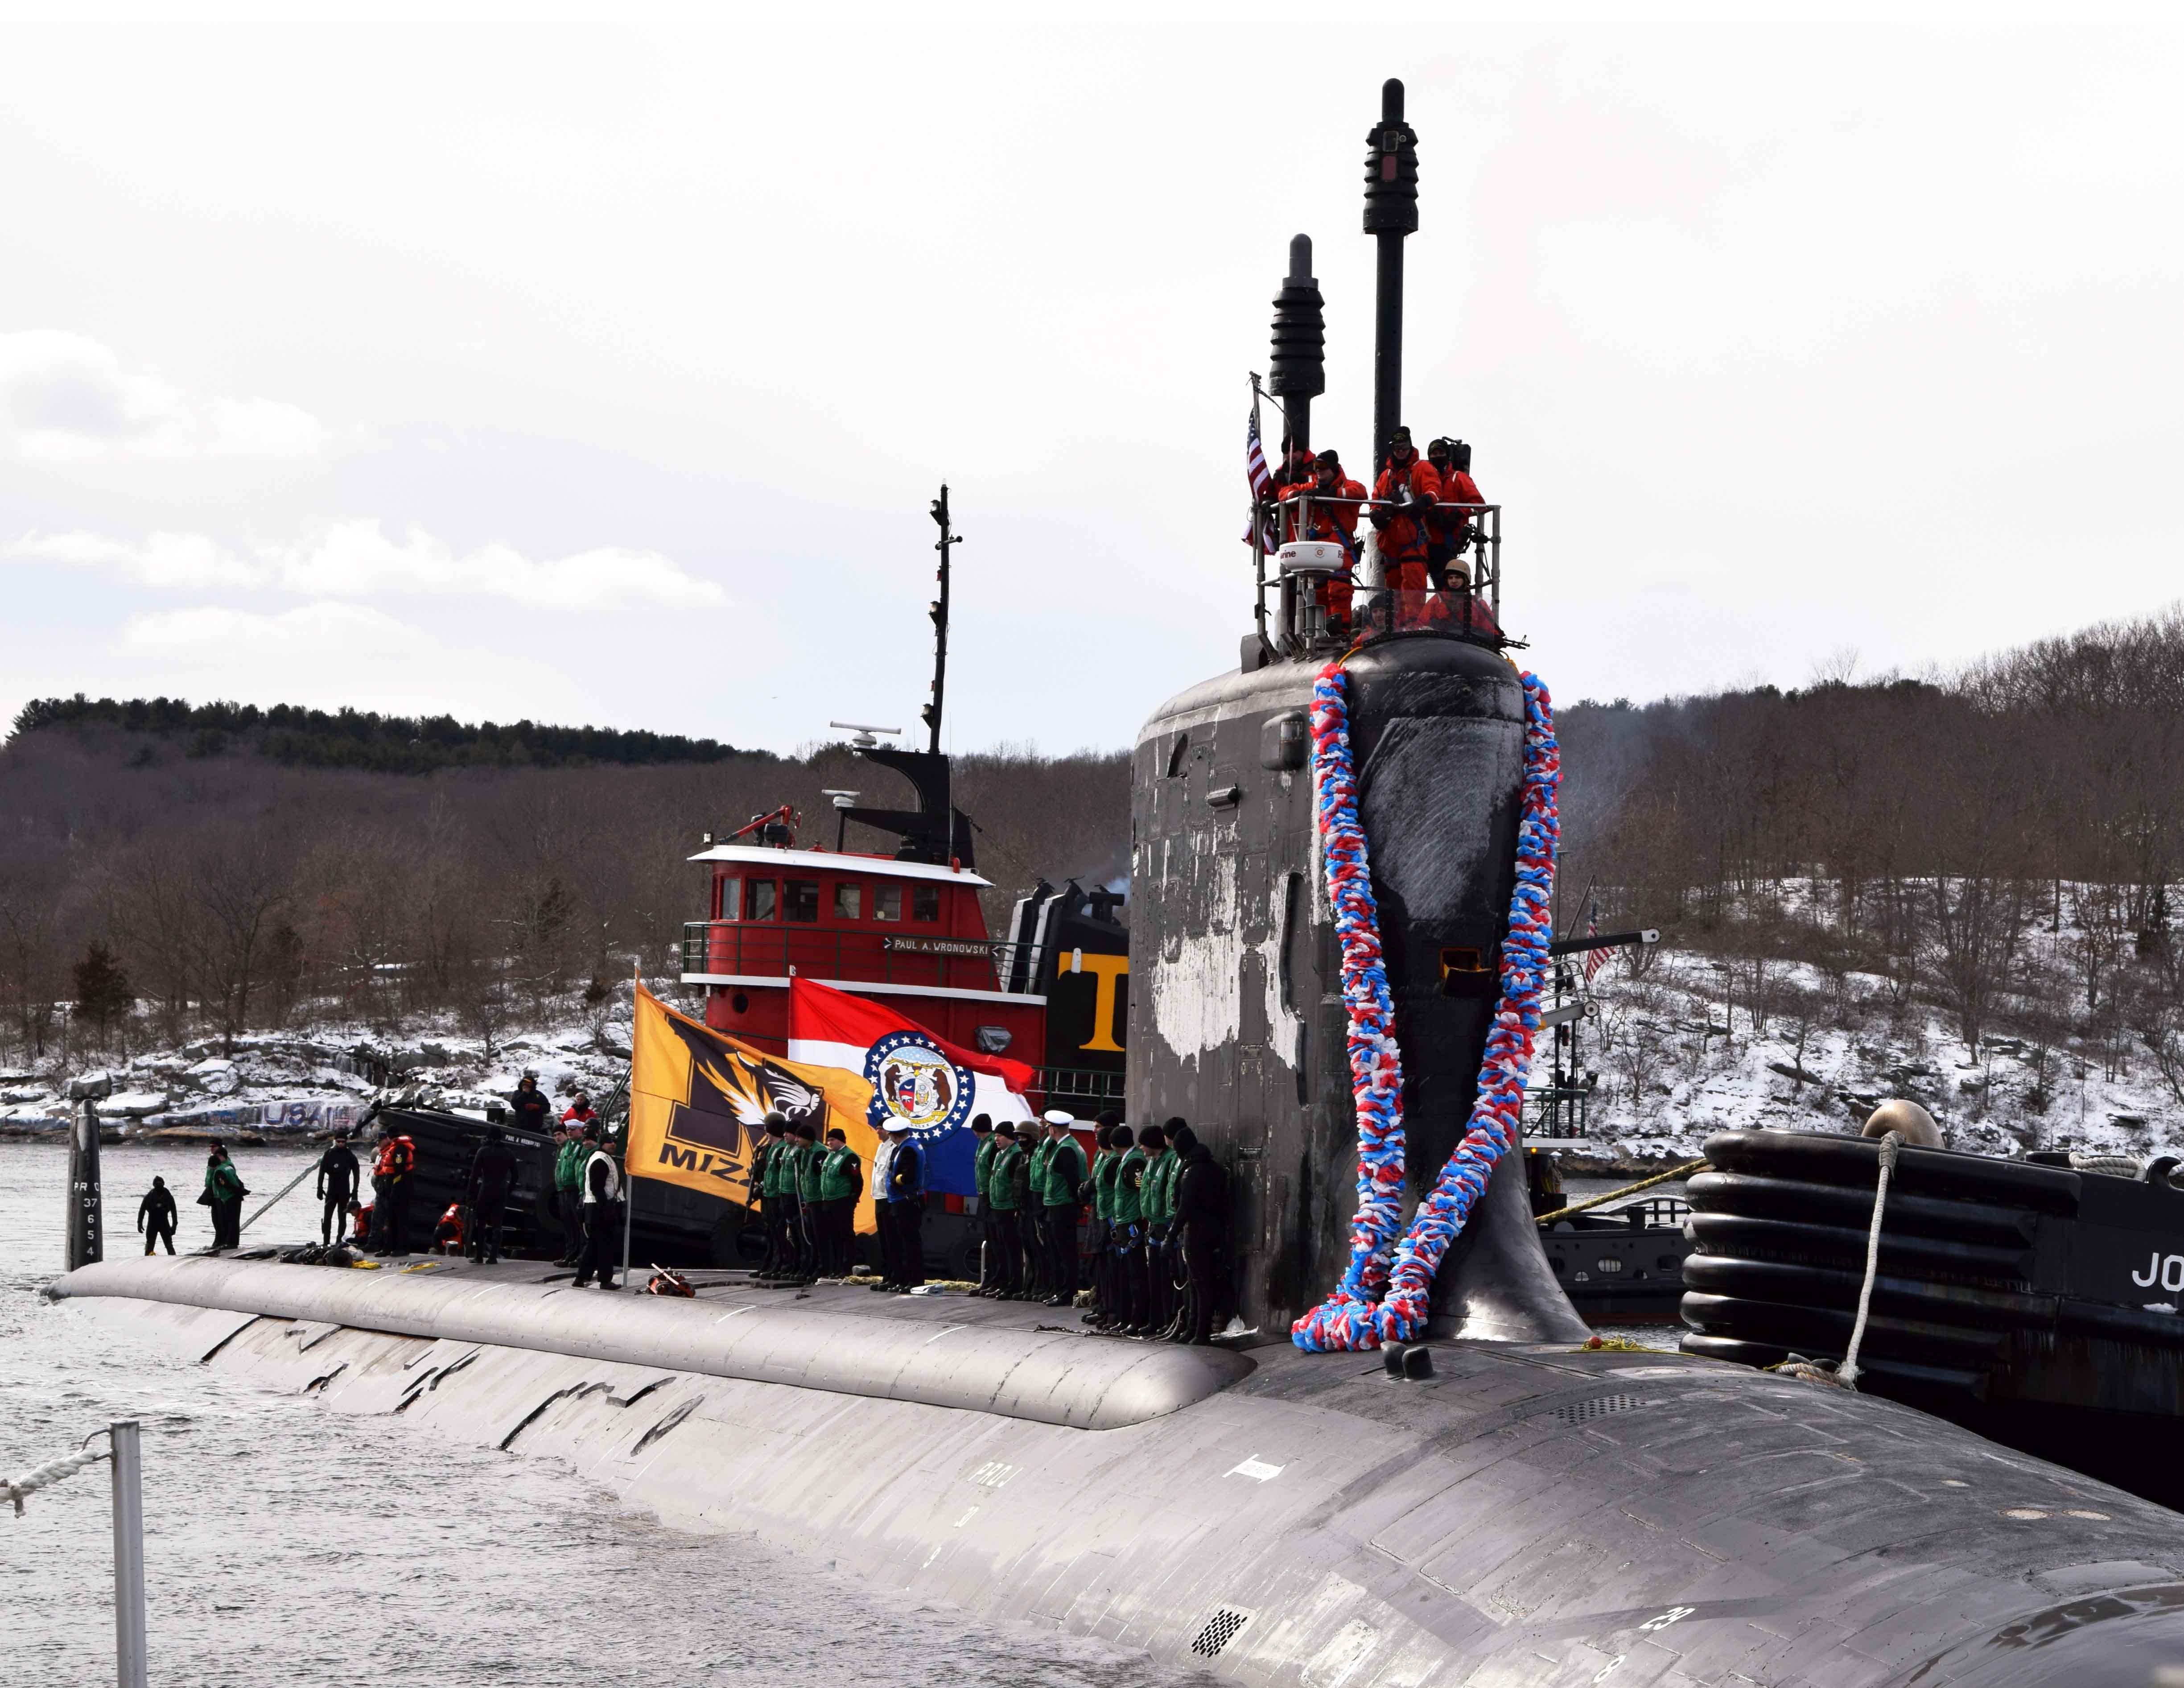 USS MISSOURI SSN-780 Einlaufen Groton am 12.02.2016 Bild: U.S. Navy